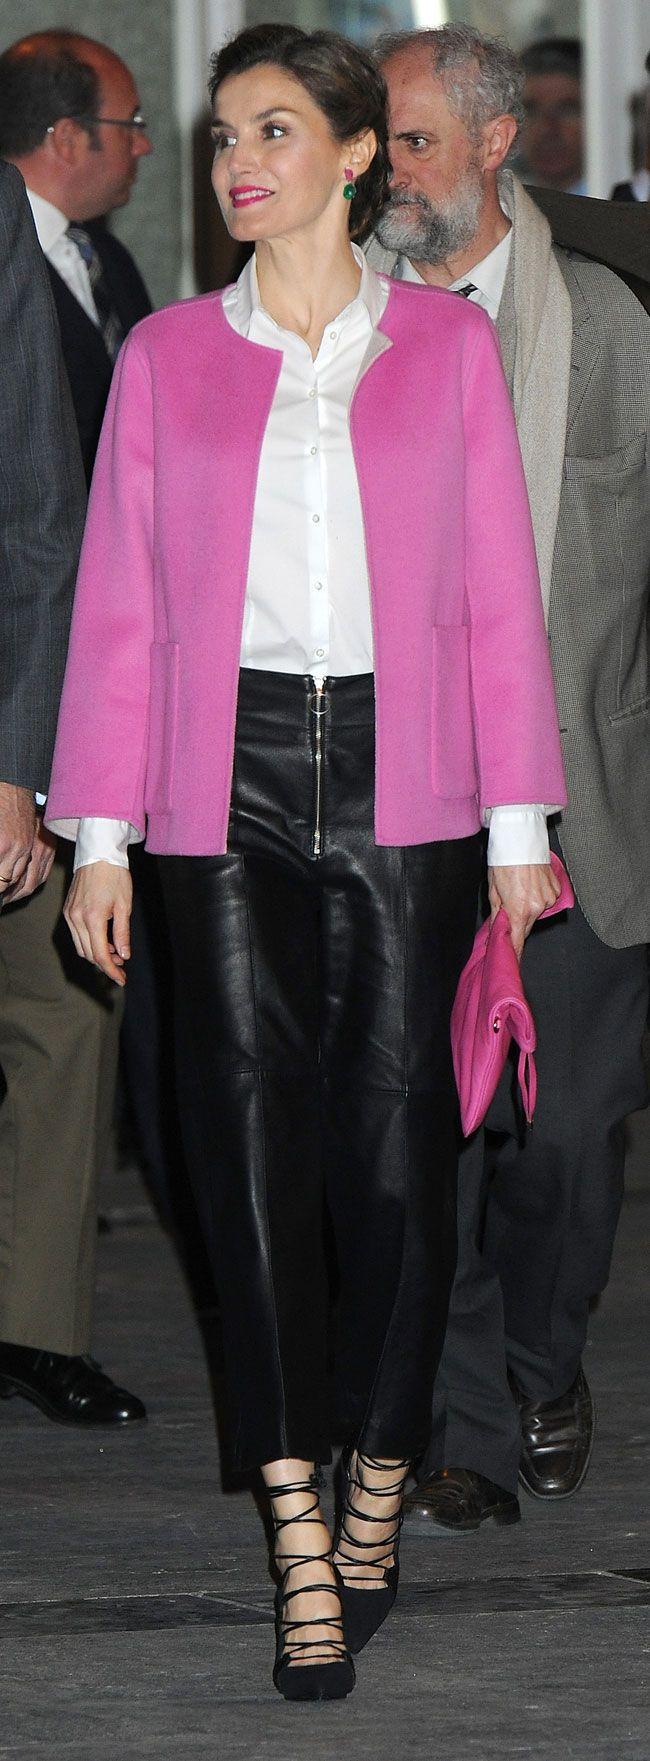 Queen Letizia. ARCO 2016. Uterque leather culotte, Carolina Herrera pink jacket. Magrit shoes. Adolfo Dominguez handbag